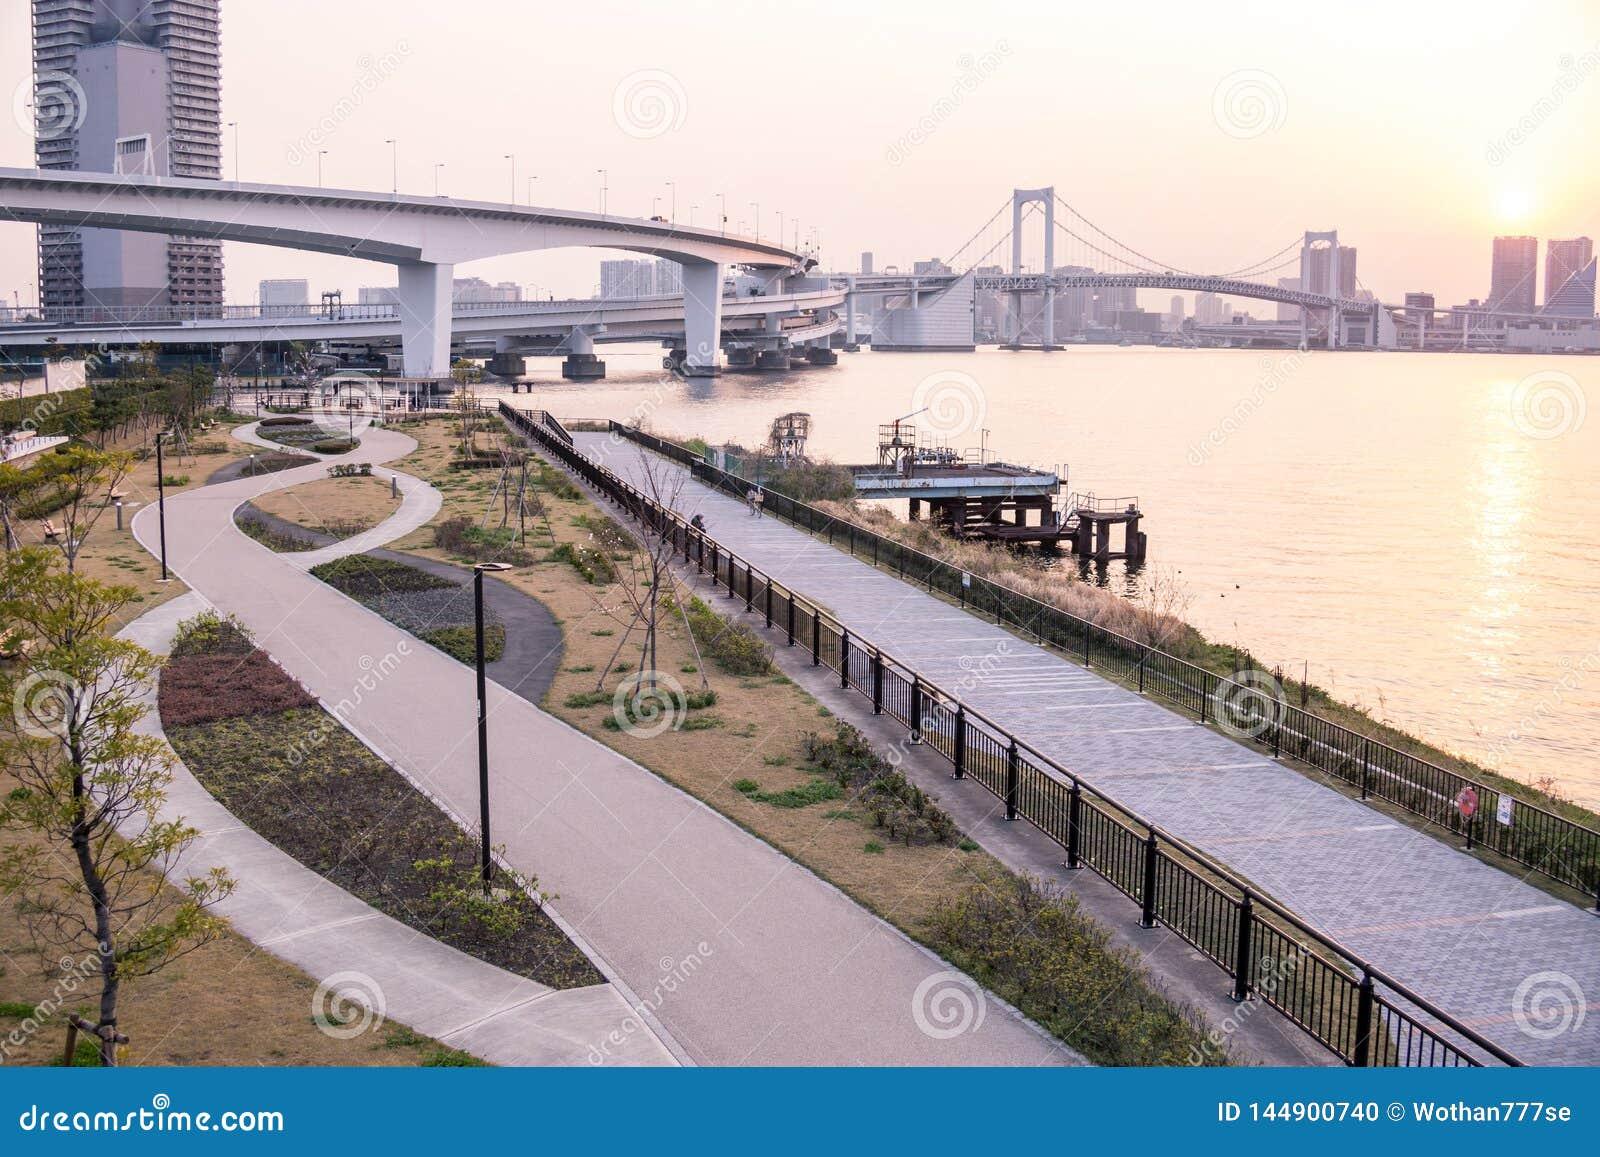 Park on tokyo bay in front of rainbow bridge